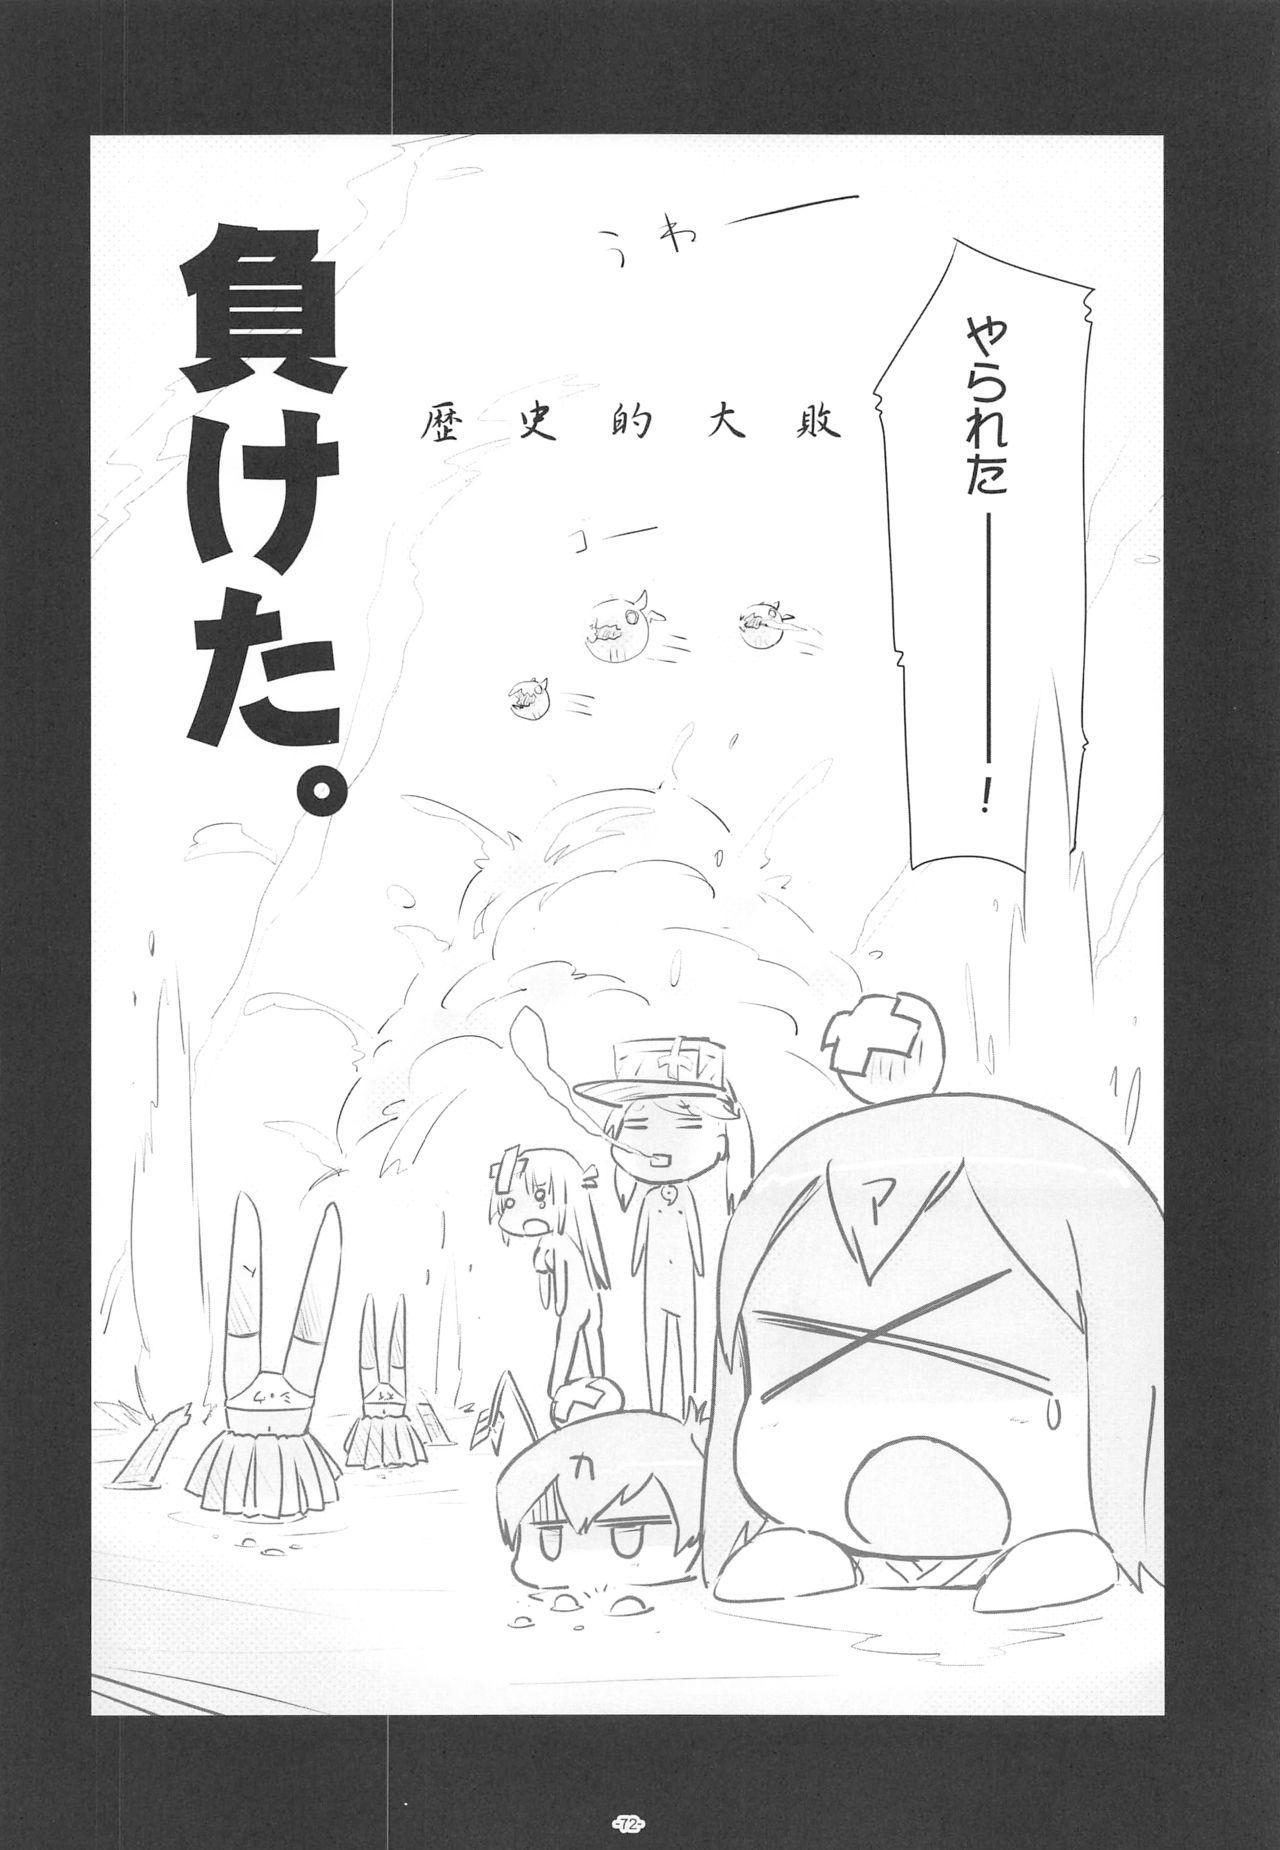 Korokoro-Manman II Korokoro:P Soushuuhen II 70